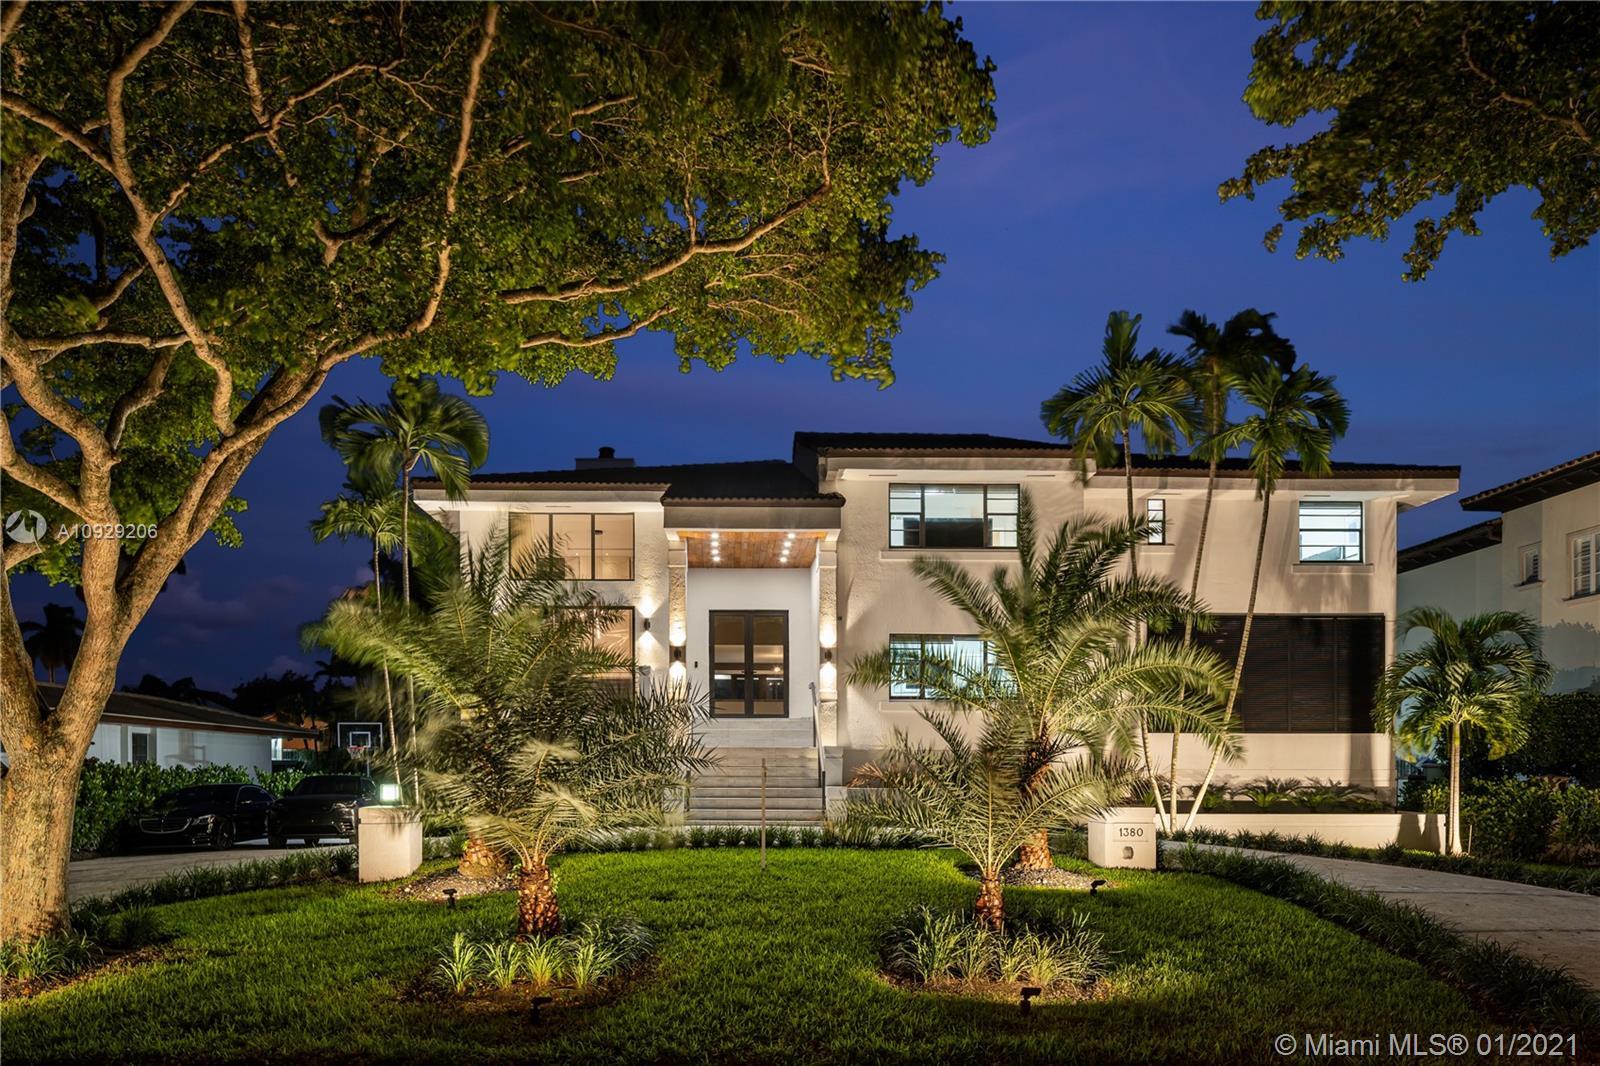 1380  Lugo Ave  For Sale A10929206, FL